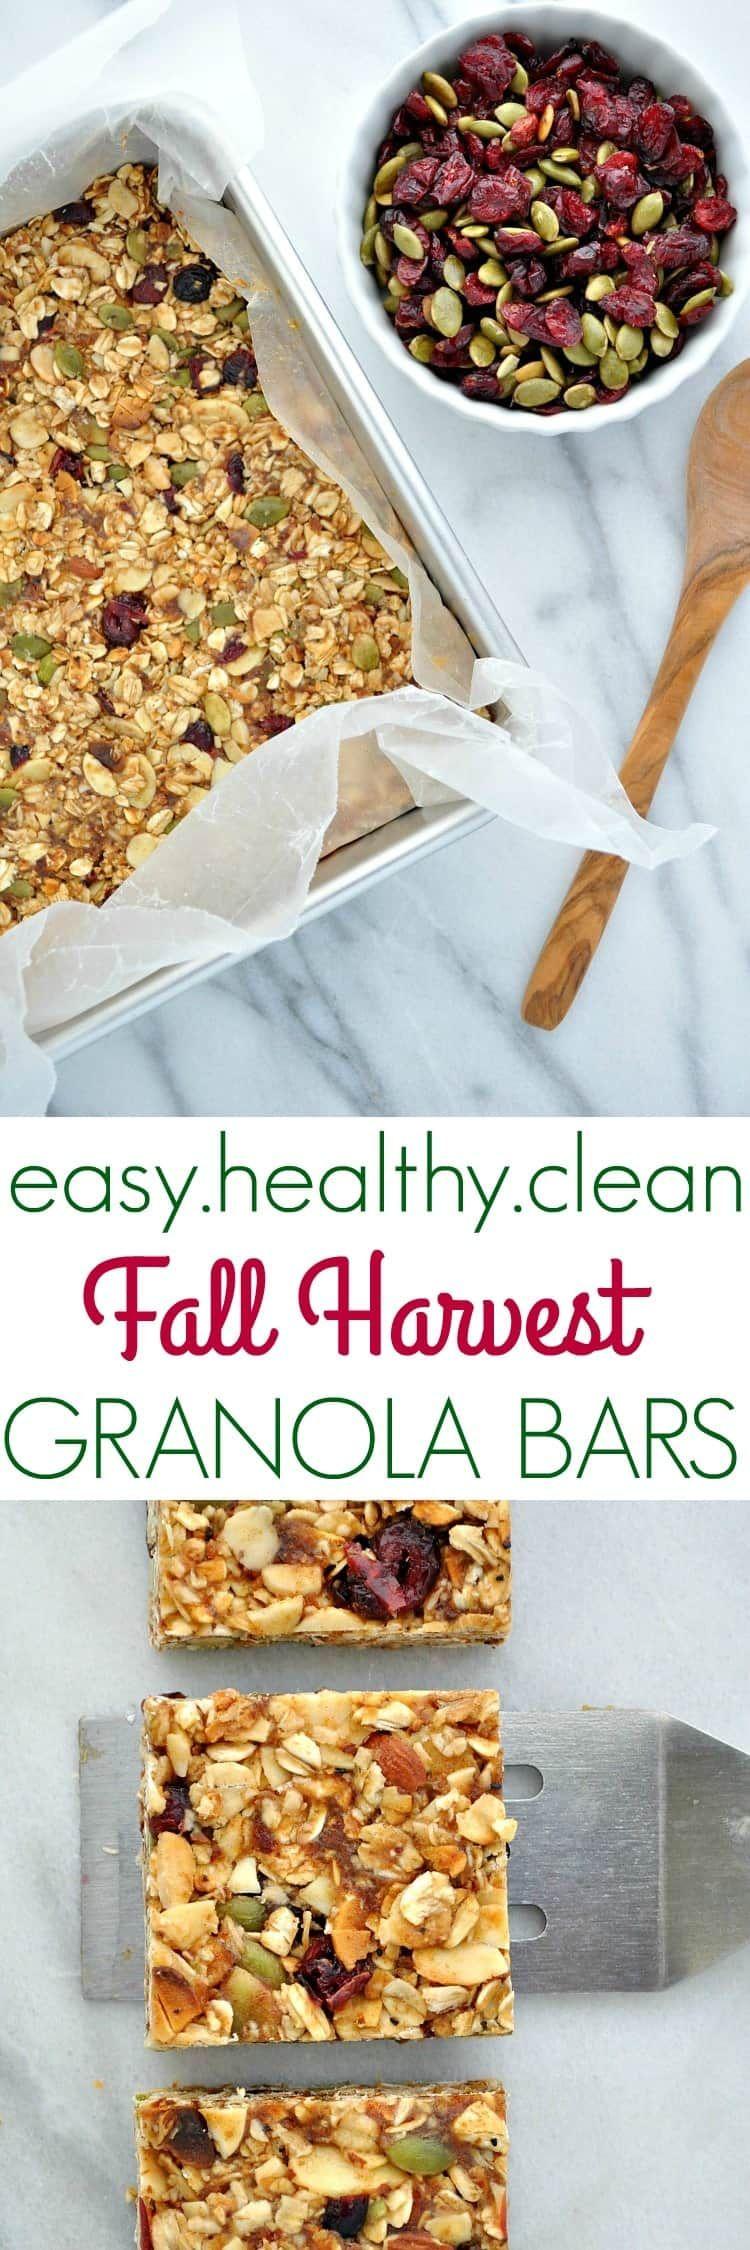 Recipe Healthy Granola Bars